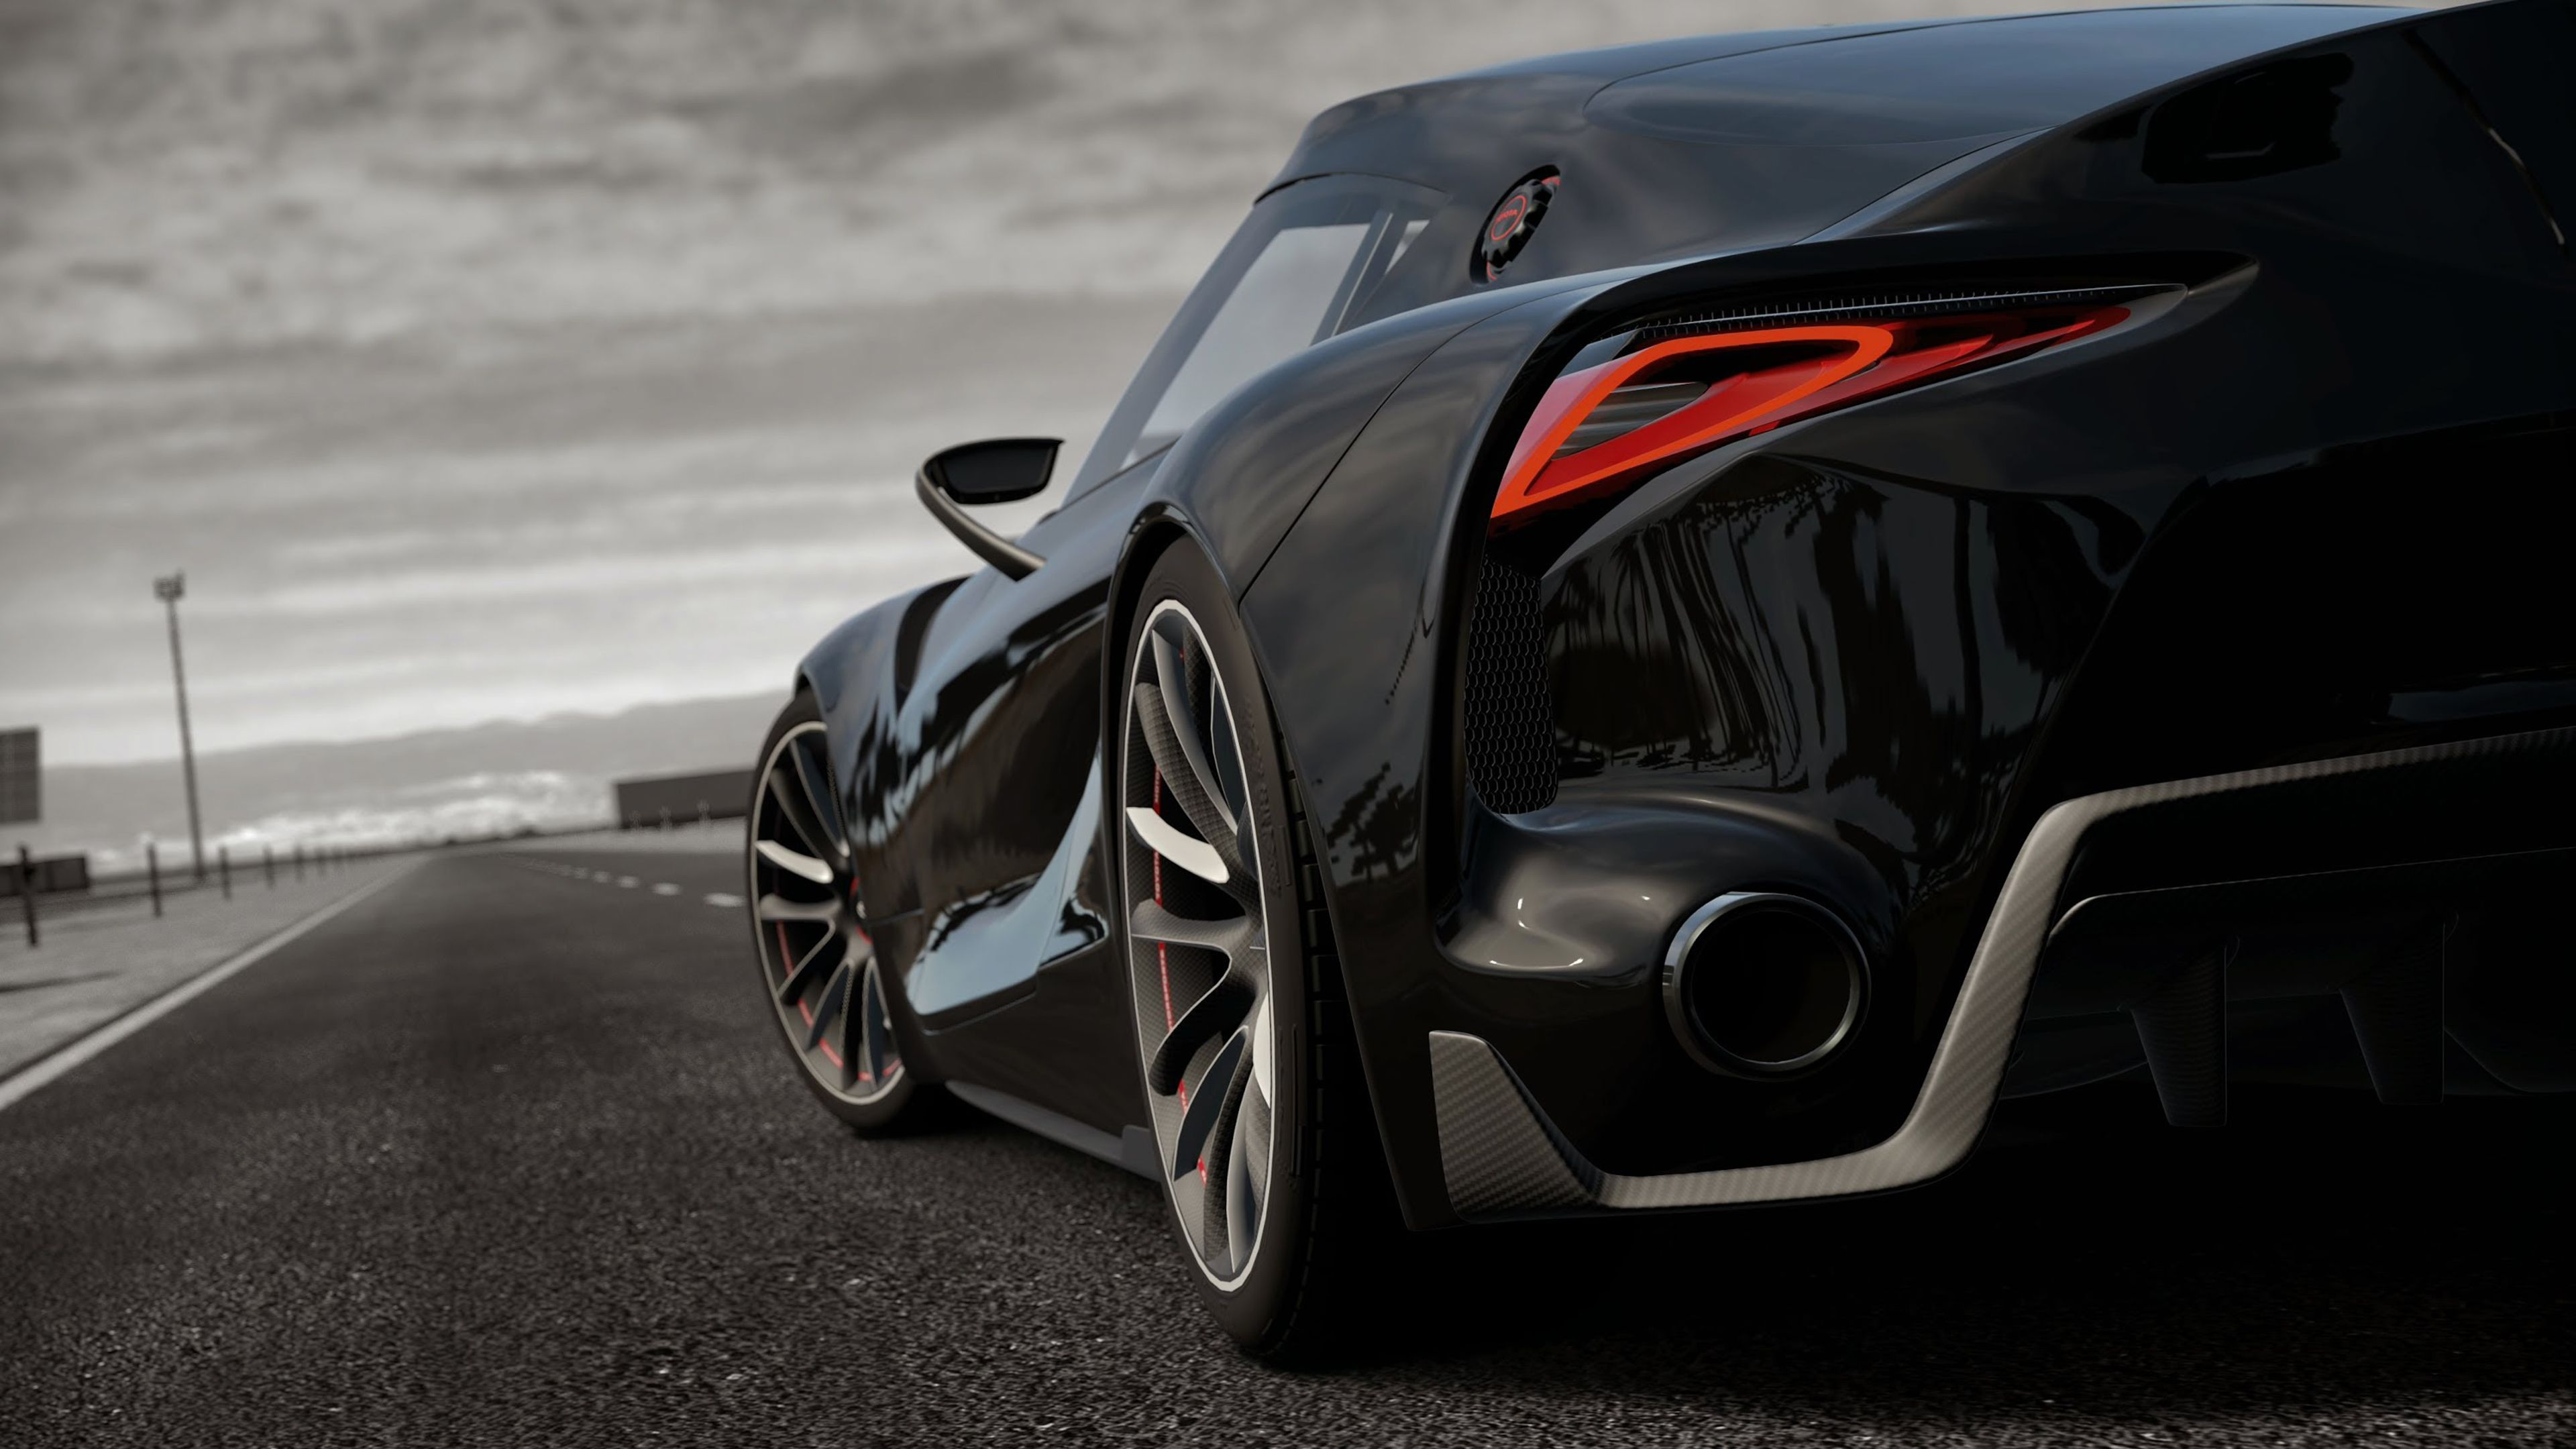 8K Ultra HD Audi Wallpapers - Top Free 8K Ultra HD Audi ...